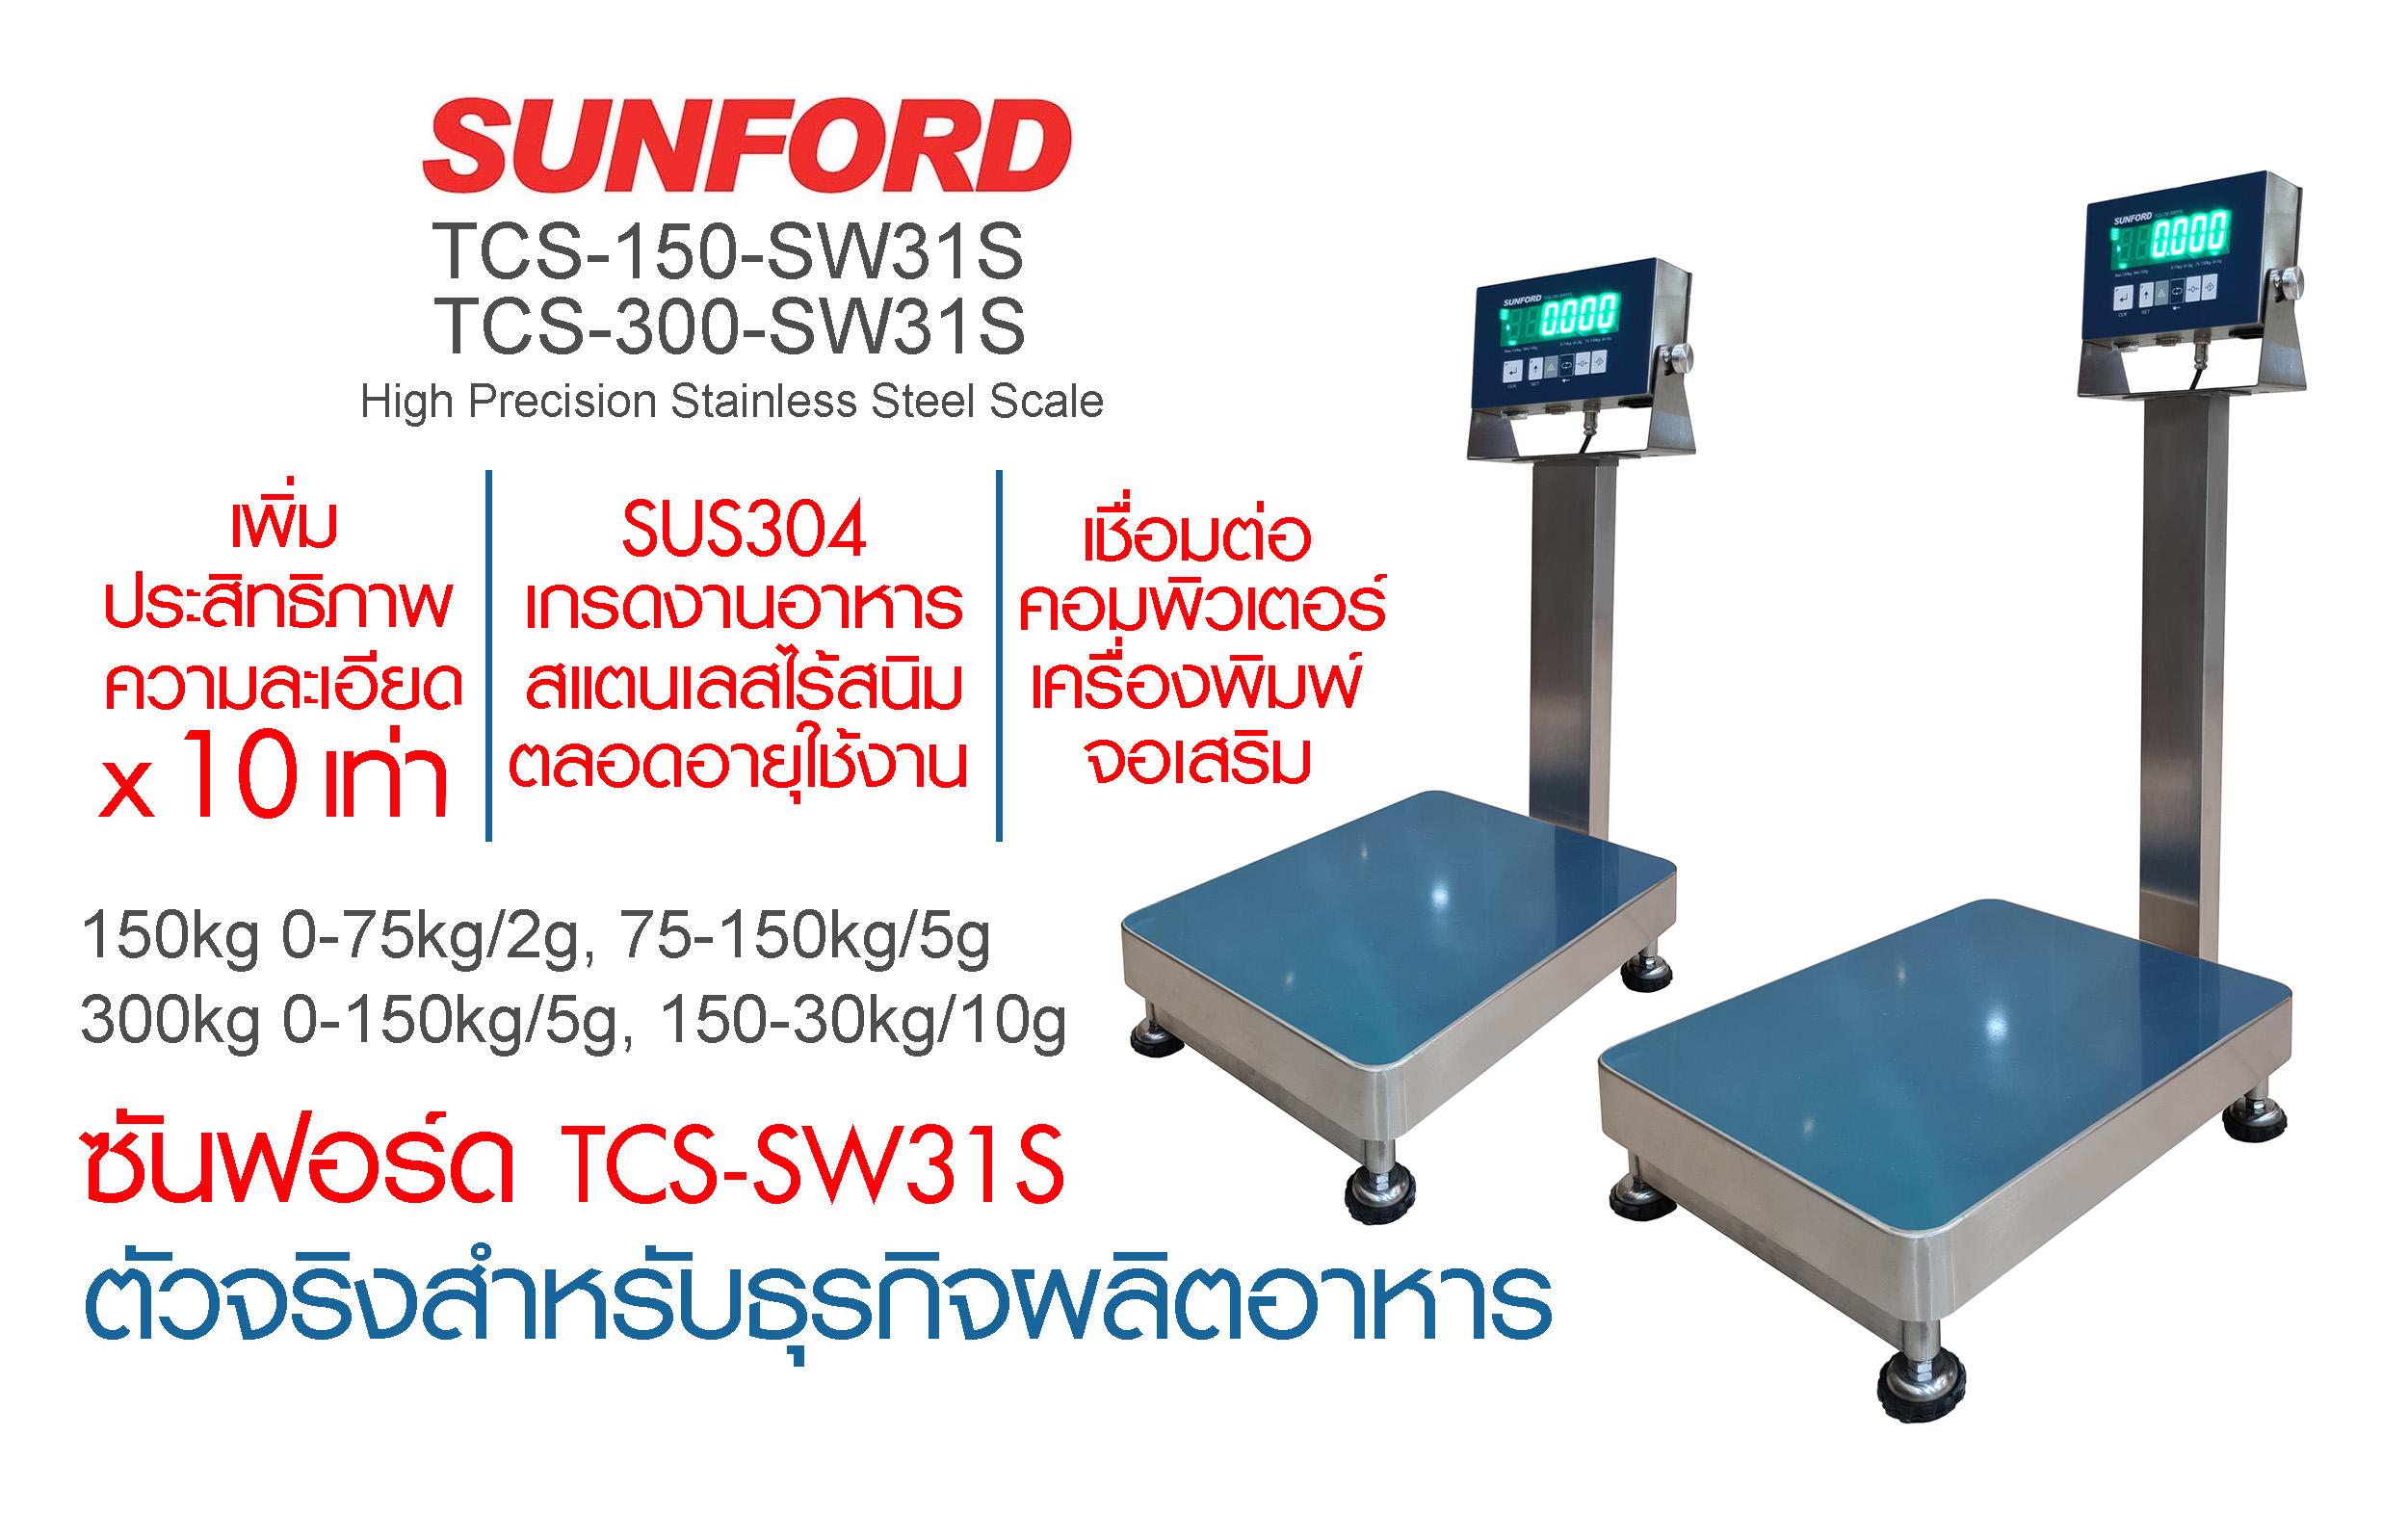 SUNFORD TCS-150-SW31S